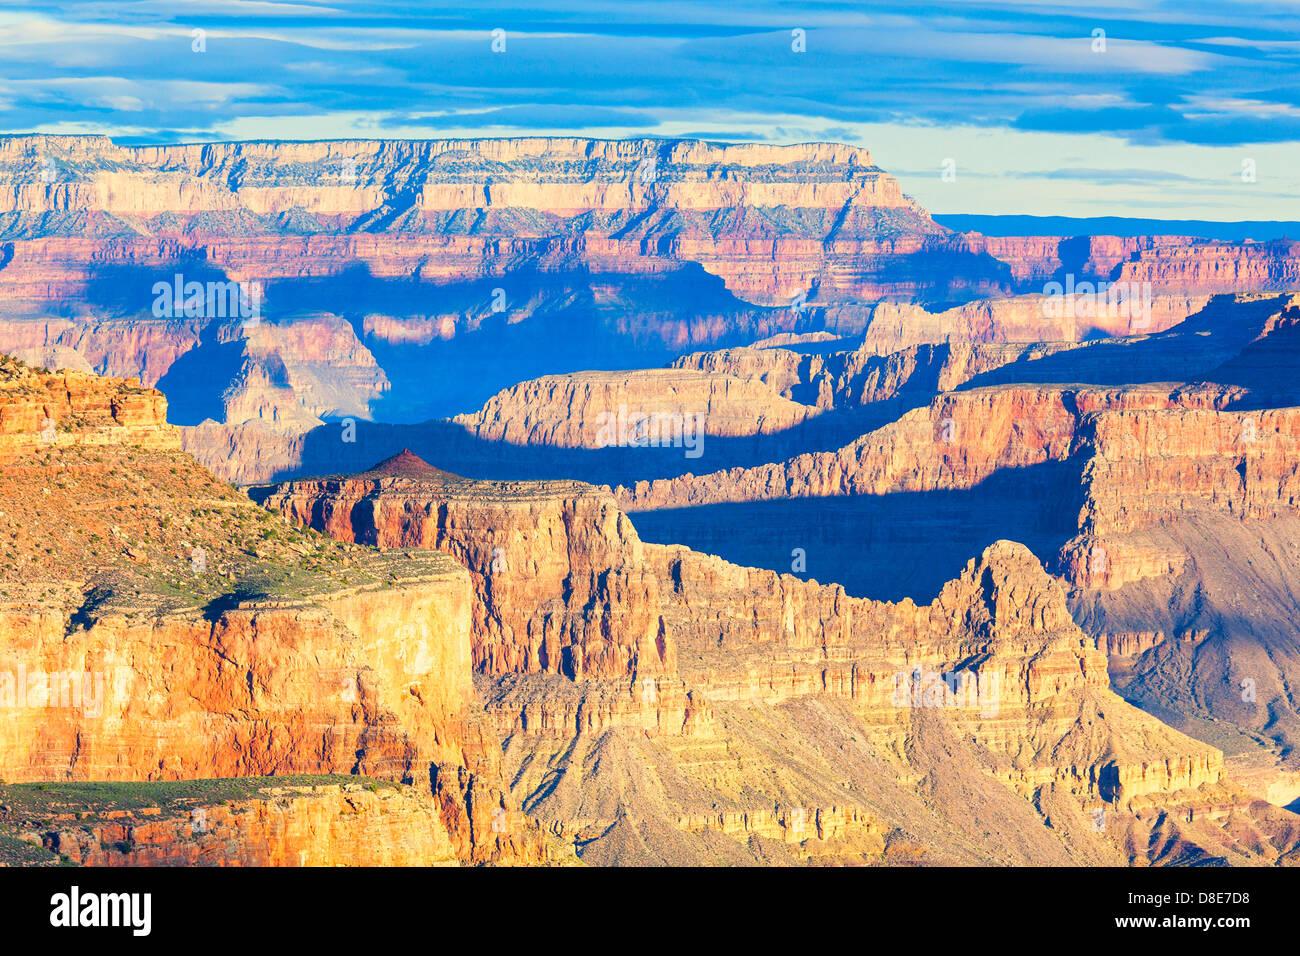 View at sunrise from South Kaibab Trail, Grand Canyon, Arizona, USA - Stock Image